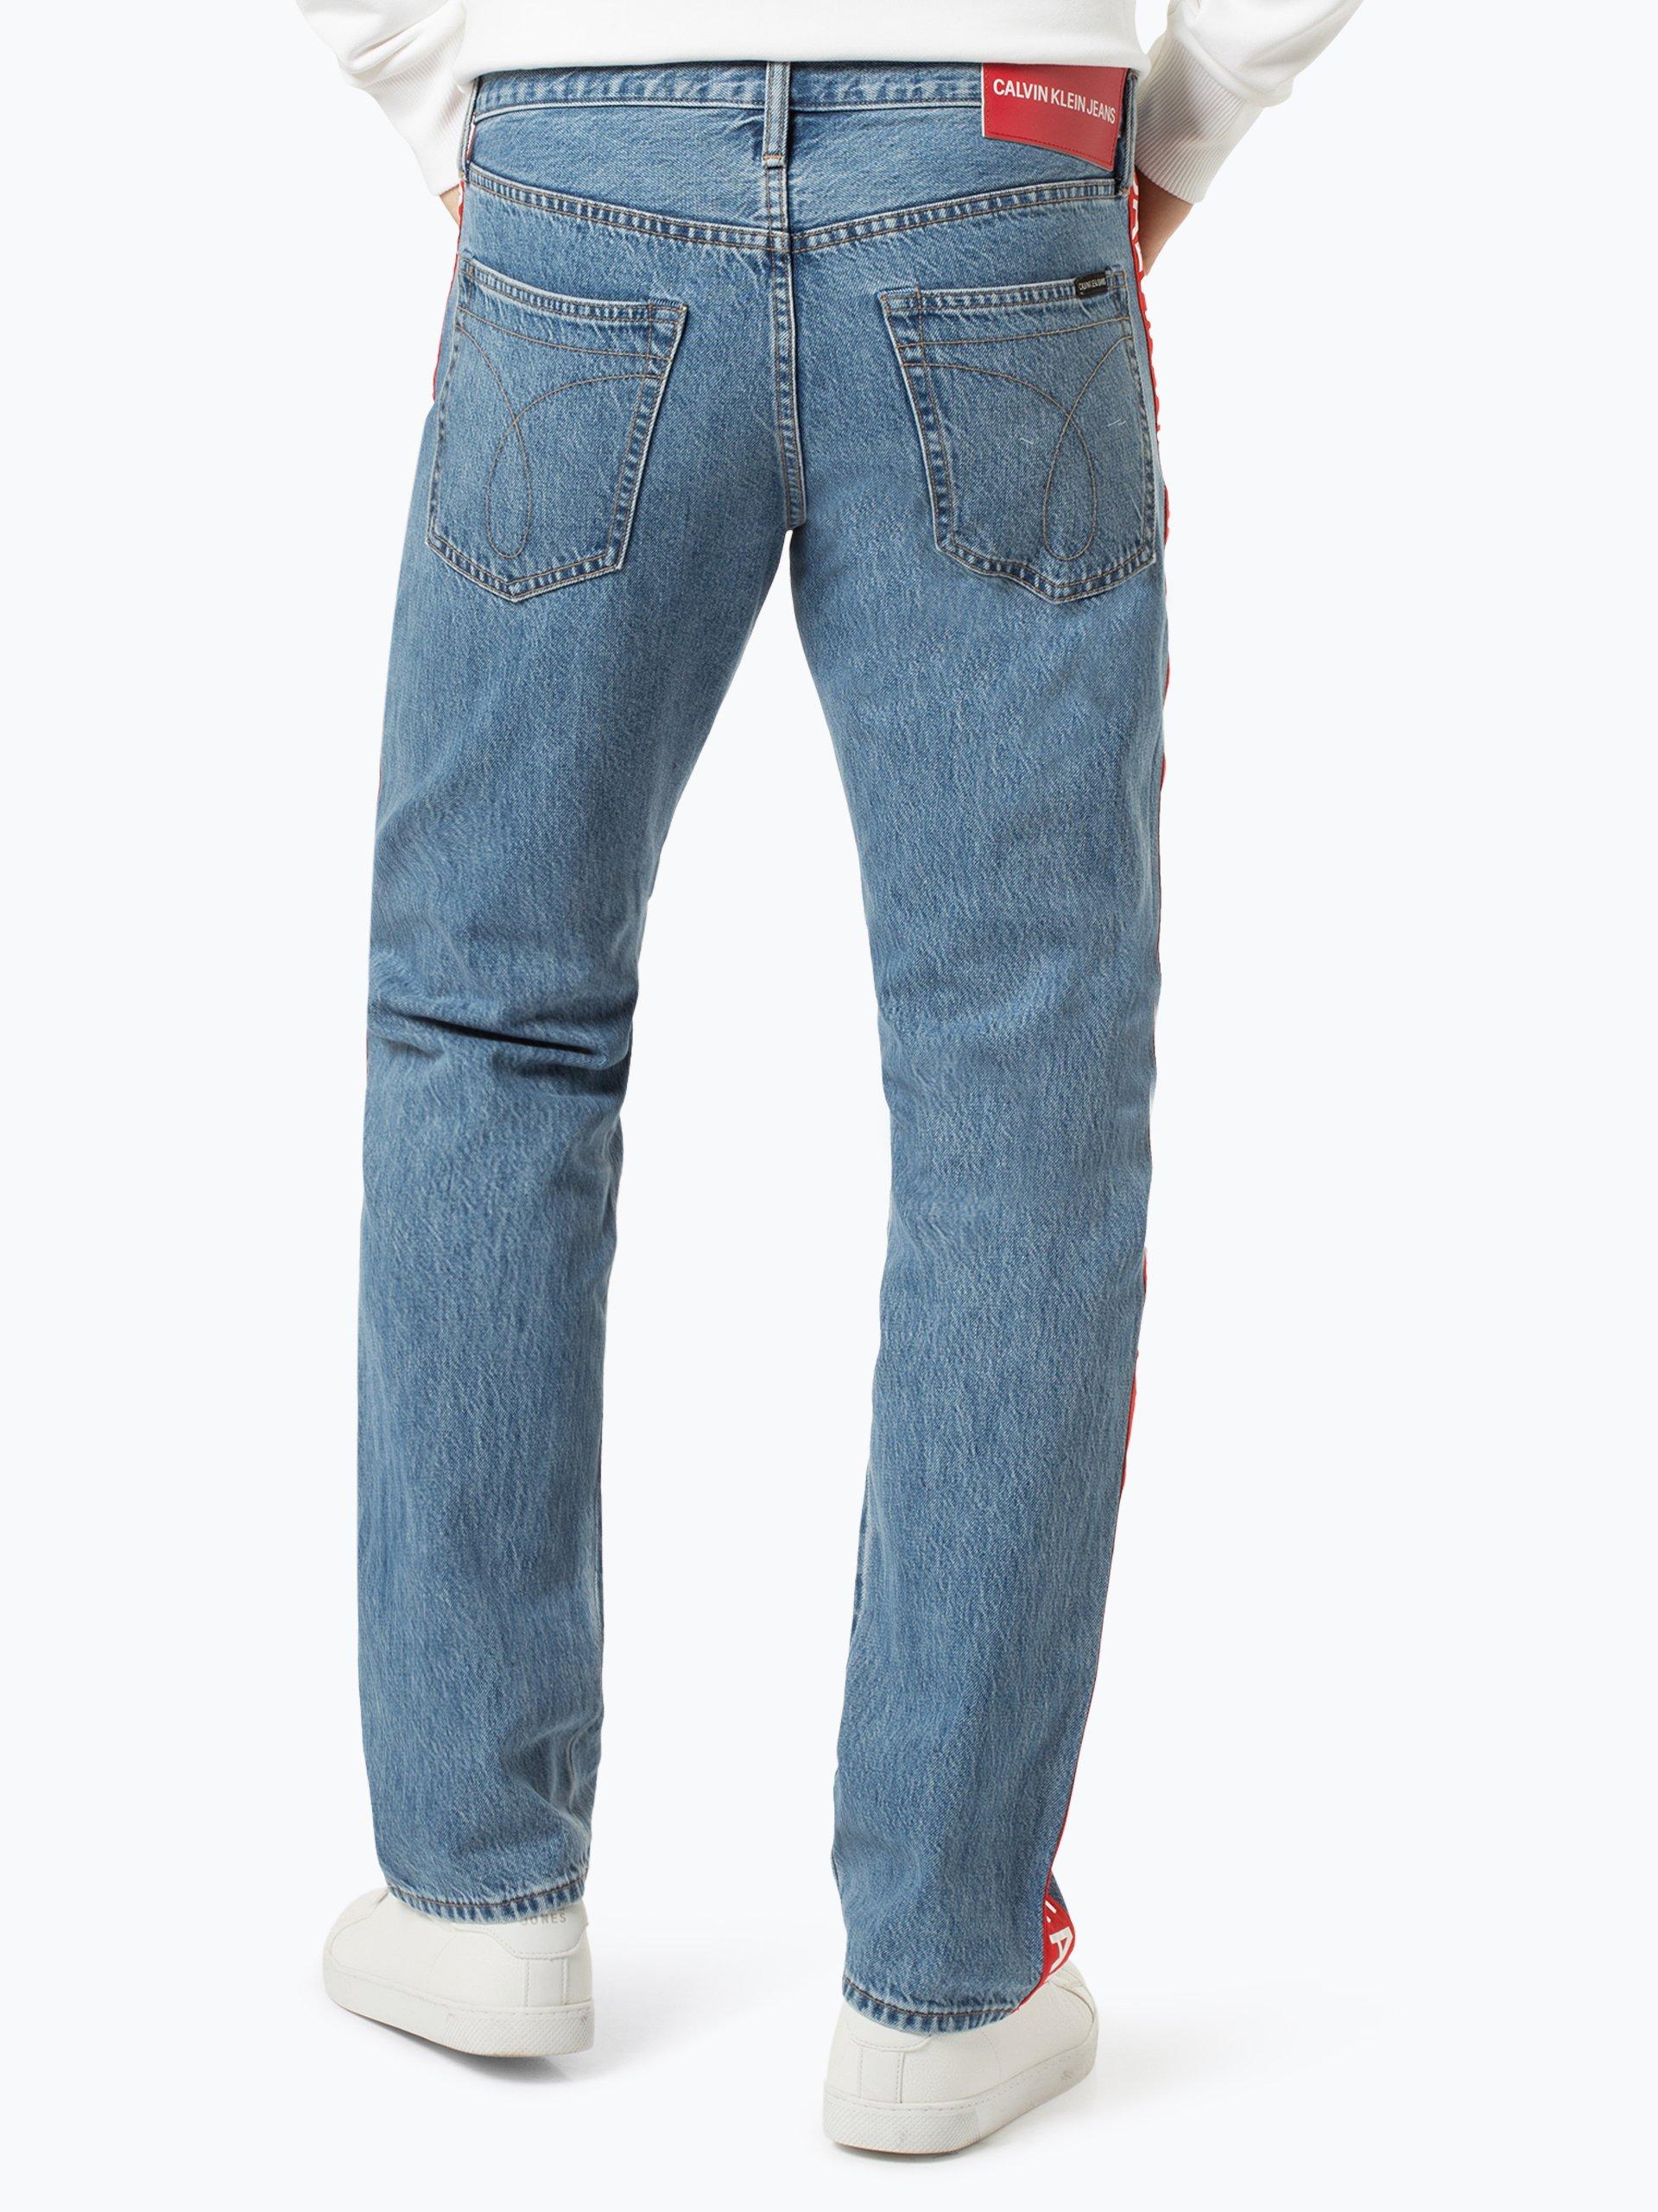 Calvin Klein Jeans Herren Jeans